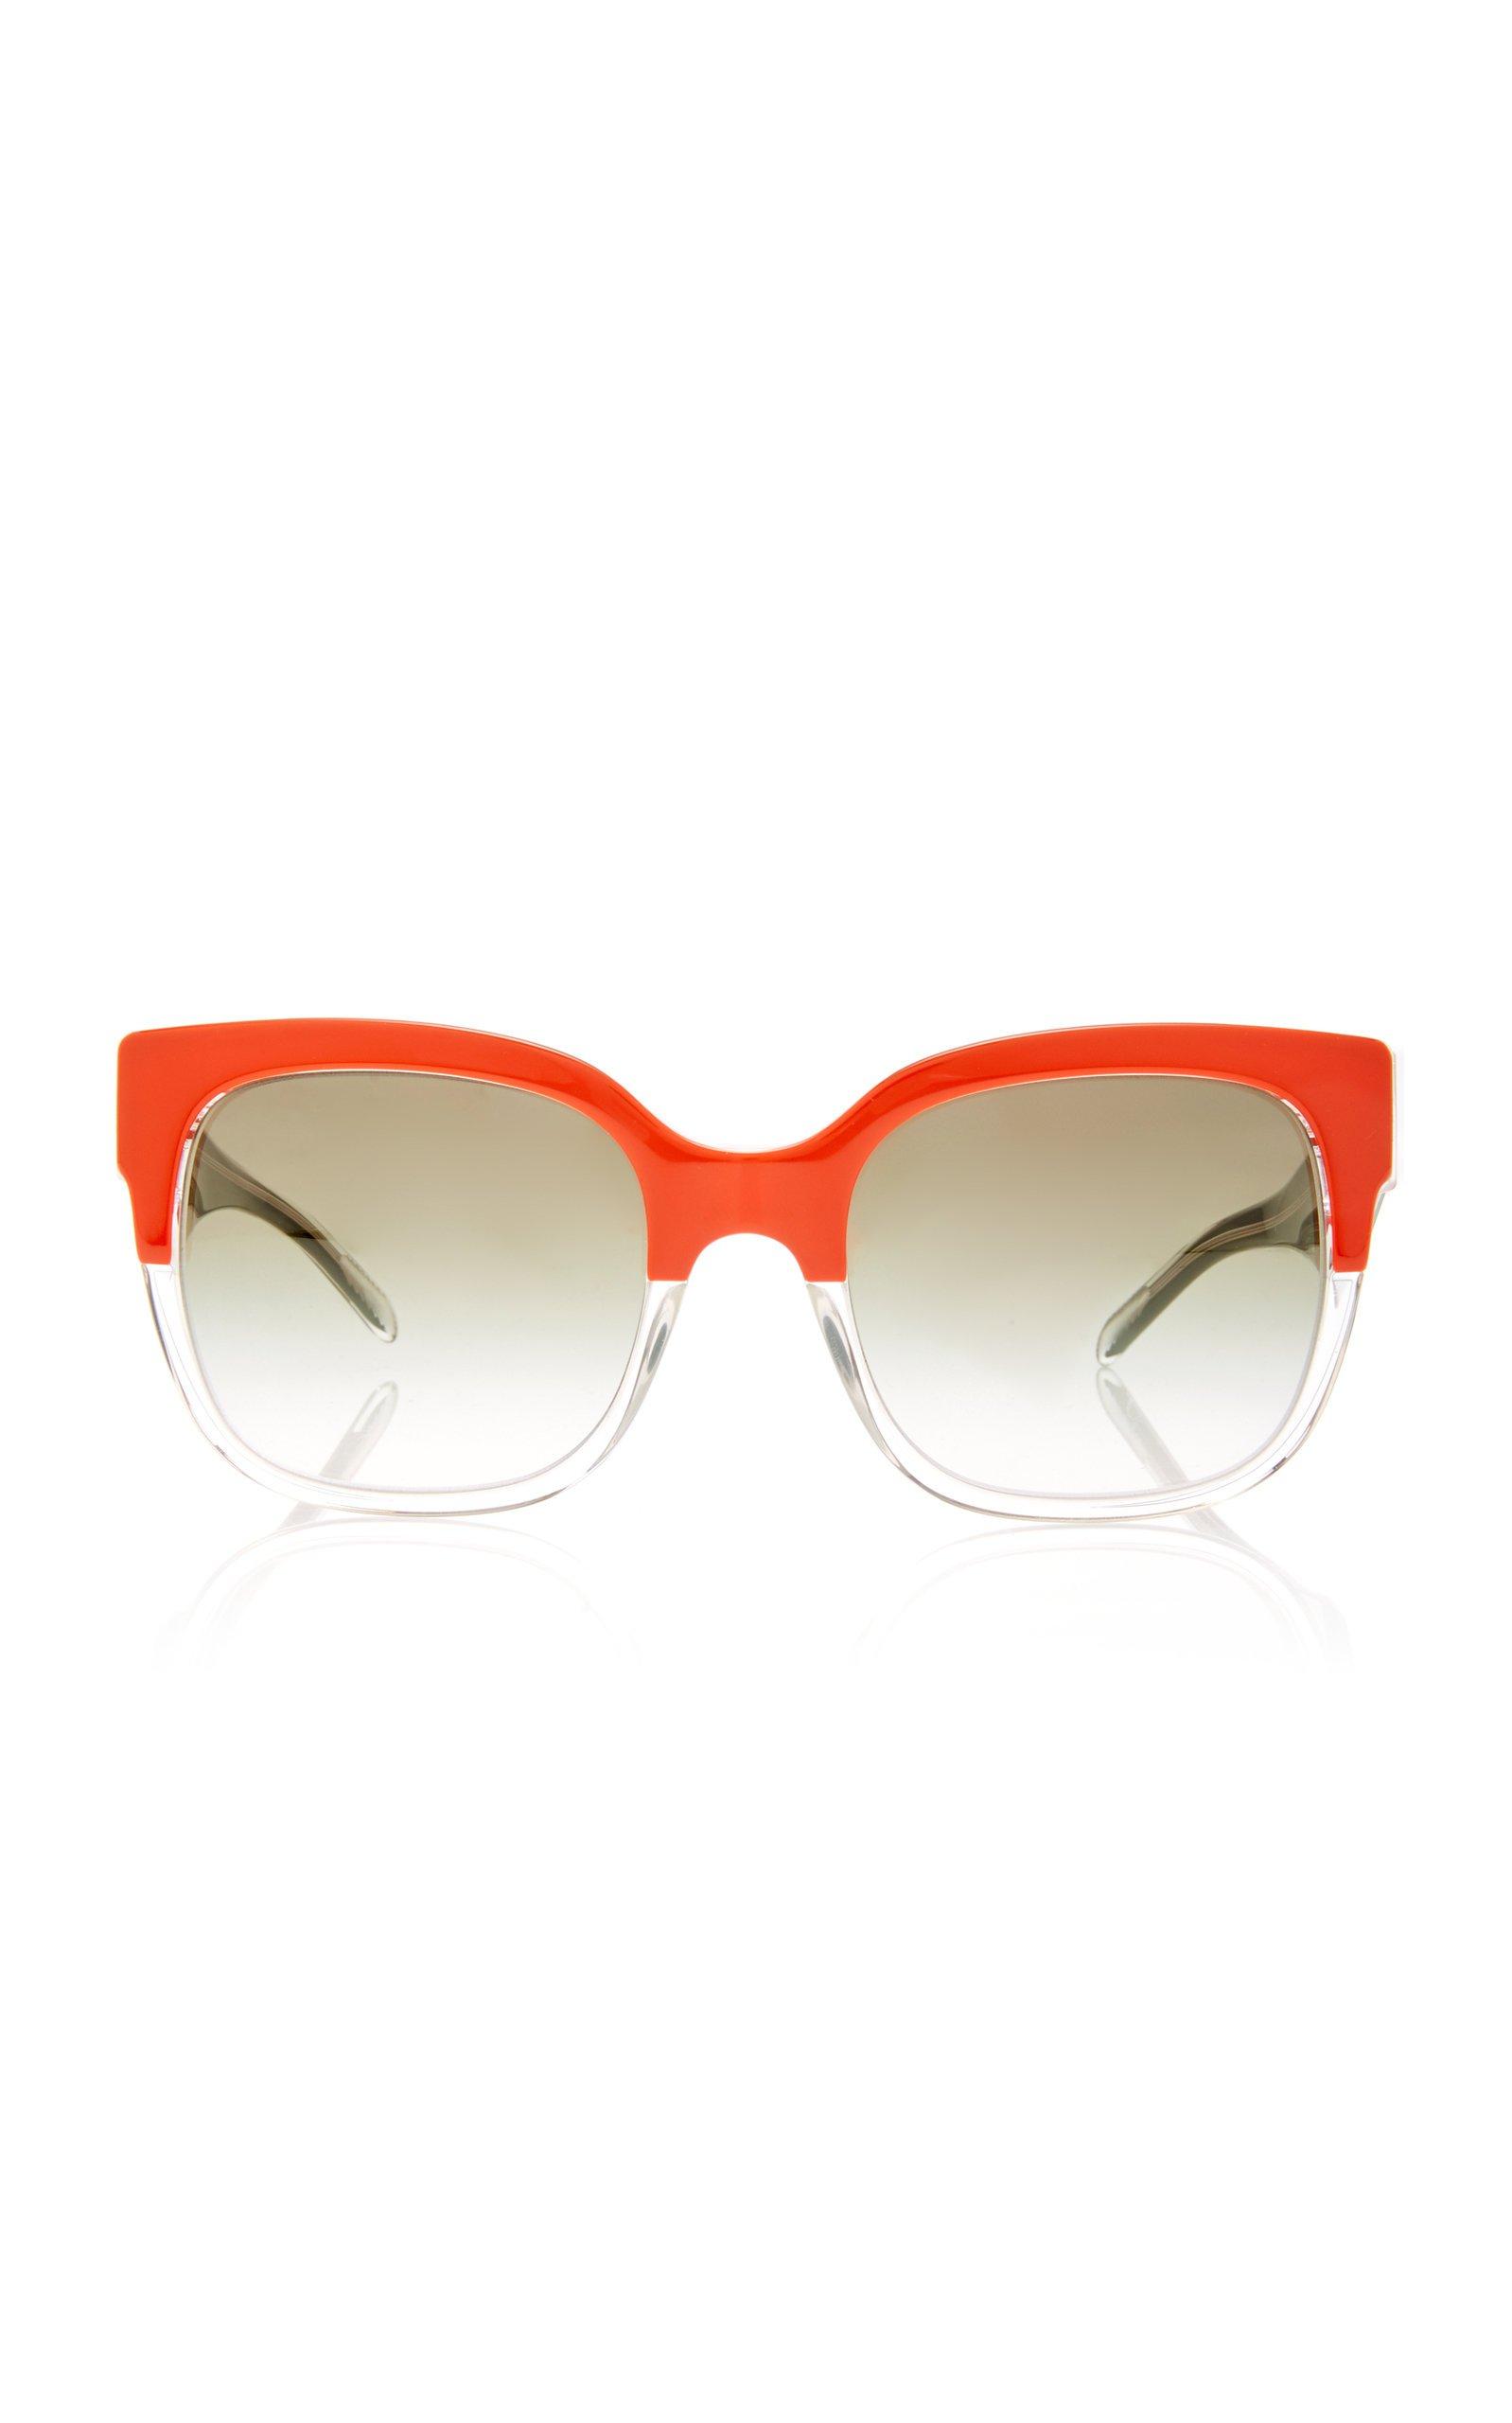 Burberry D-Frame Color-Block Acetate Sunglasses